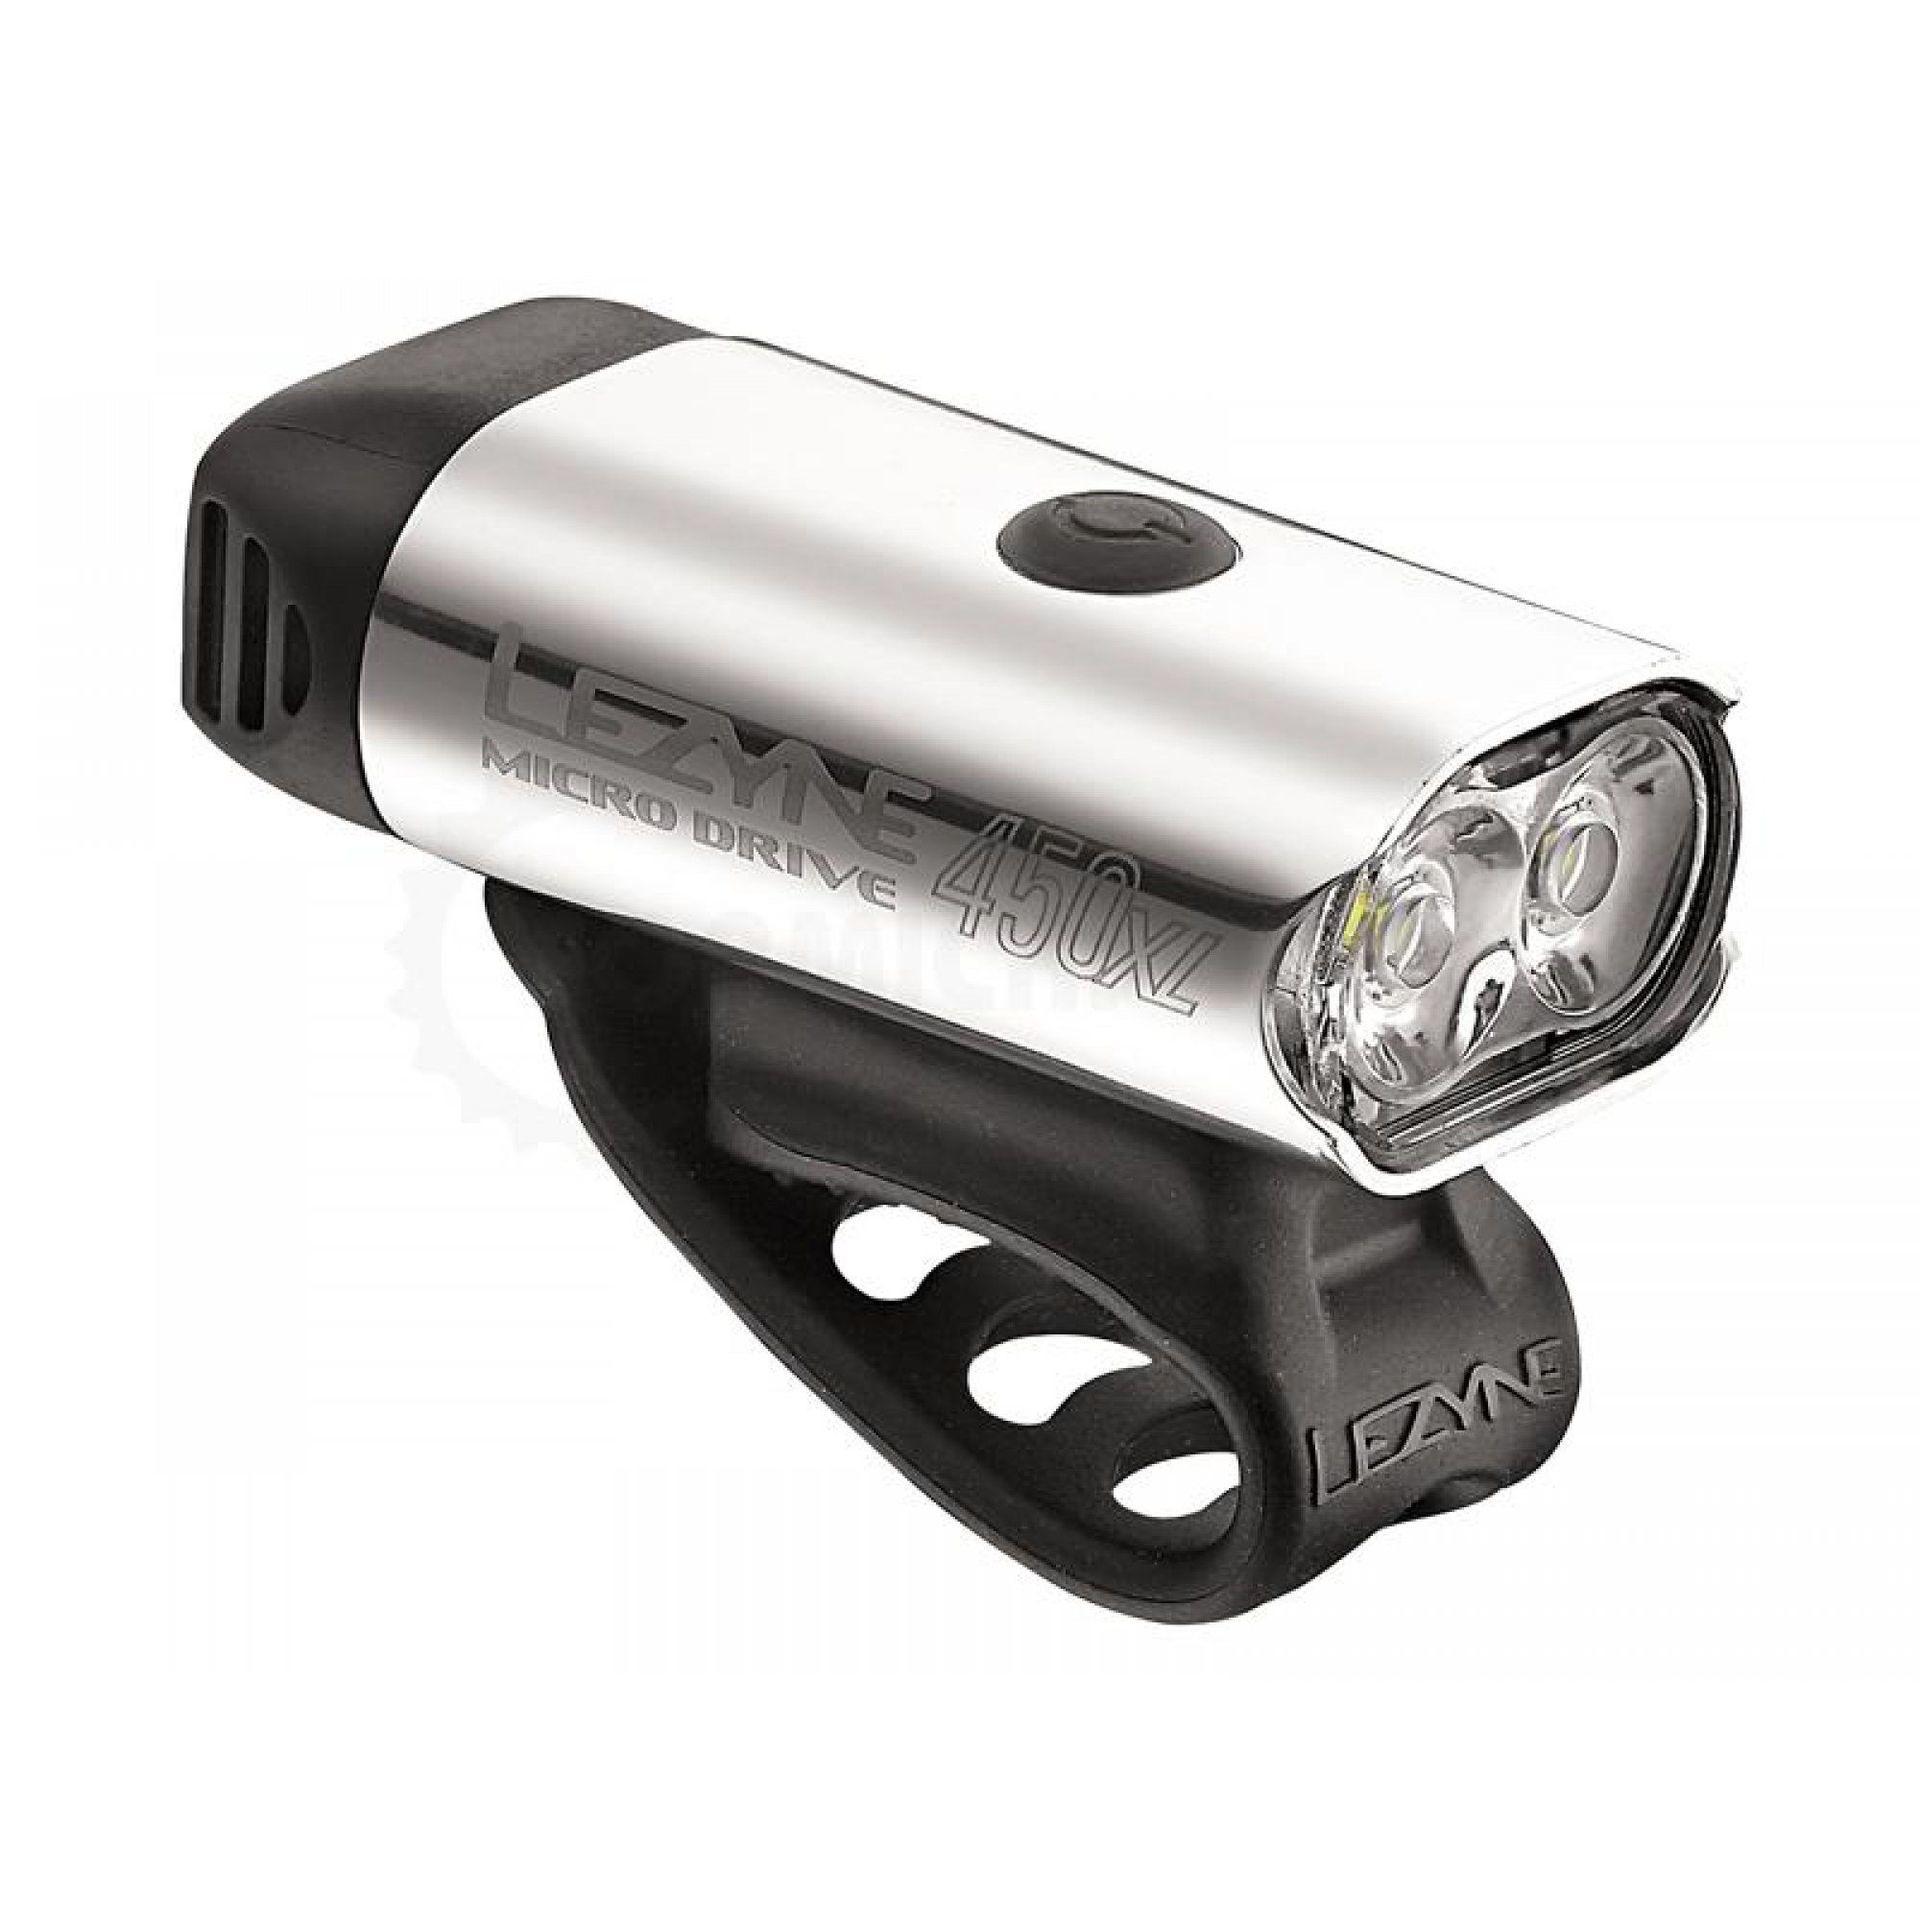 LAMPKA ROWEROWA PRZEDNIA LEZYNE LED MICRO DRIVE 450 XL